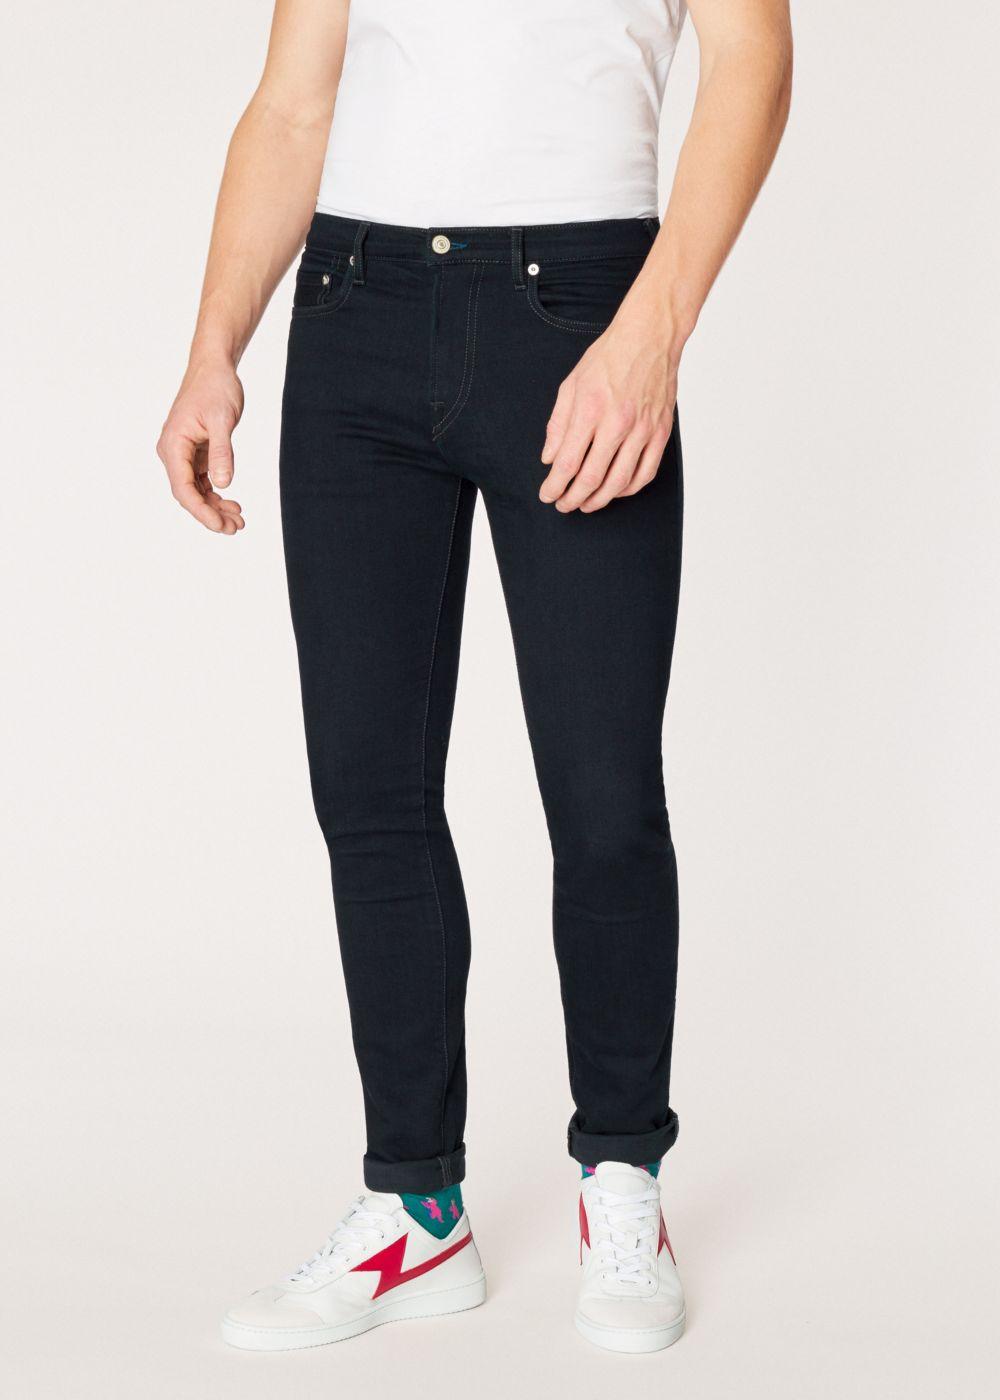 △ Paul Smith Men's Slim-Standard 'Blue/Black Reflex' Jeans  GB£58 (~HK$552)